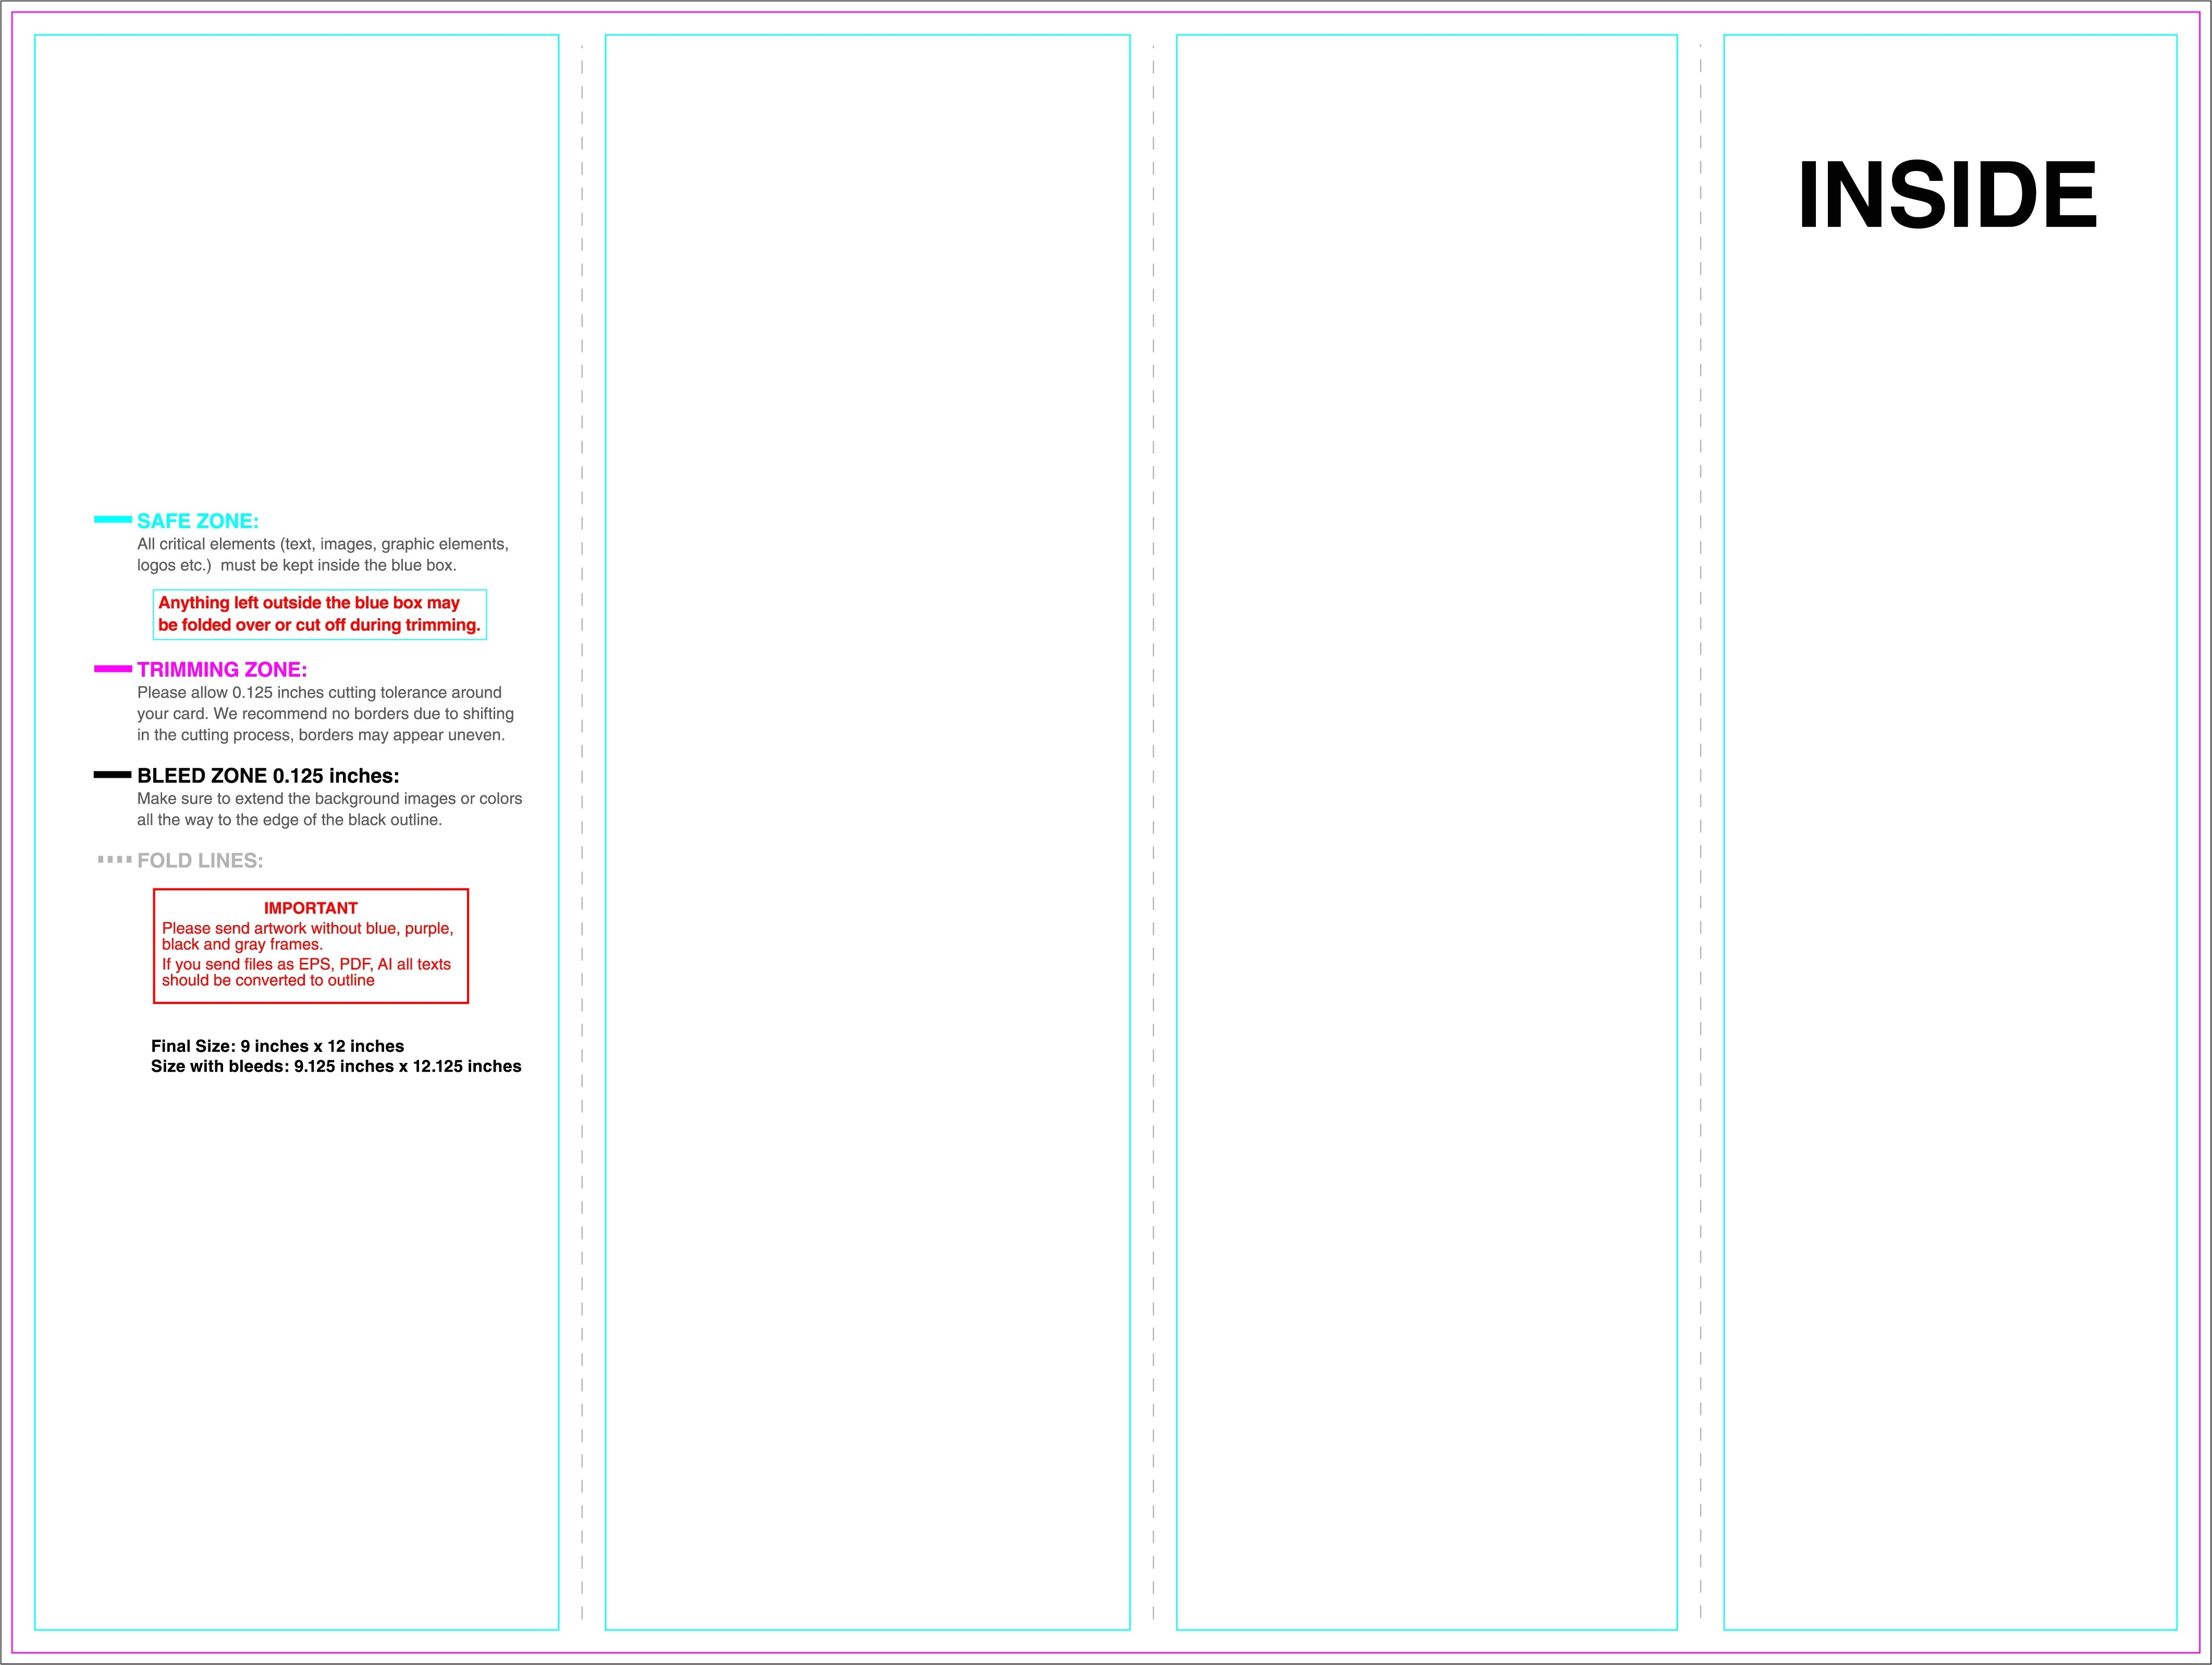 4 Panel Brochure Template Free Download Brochure Outline 4 Panel Brochure Template Full Size